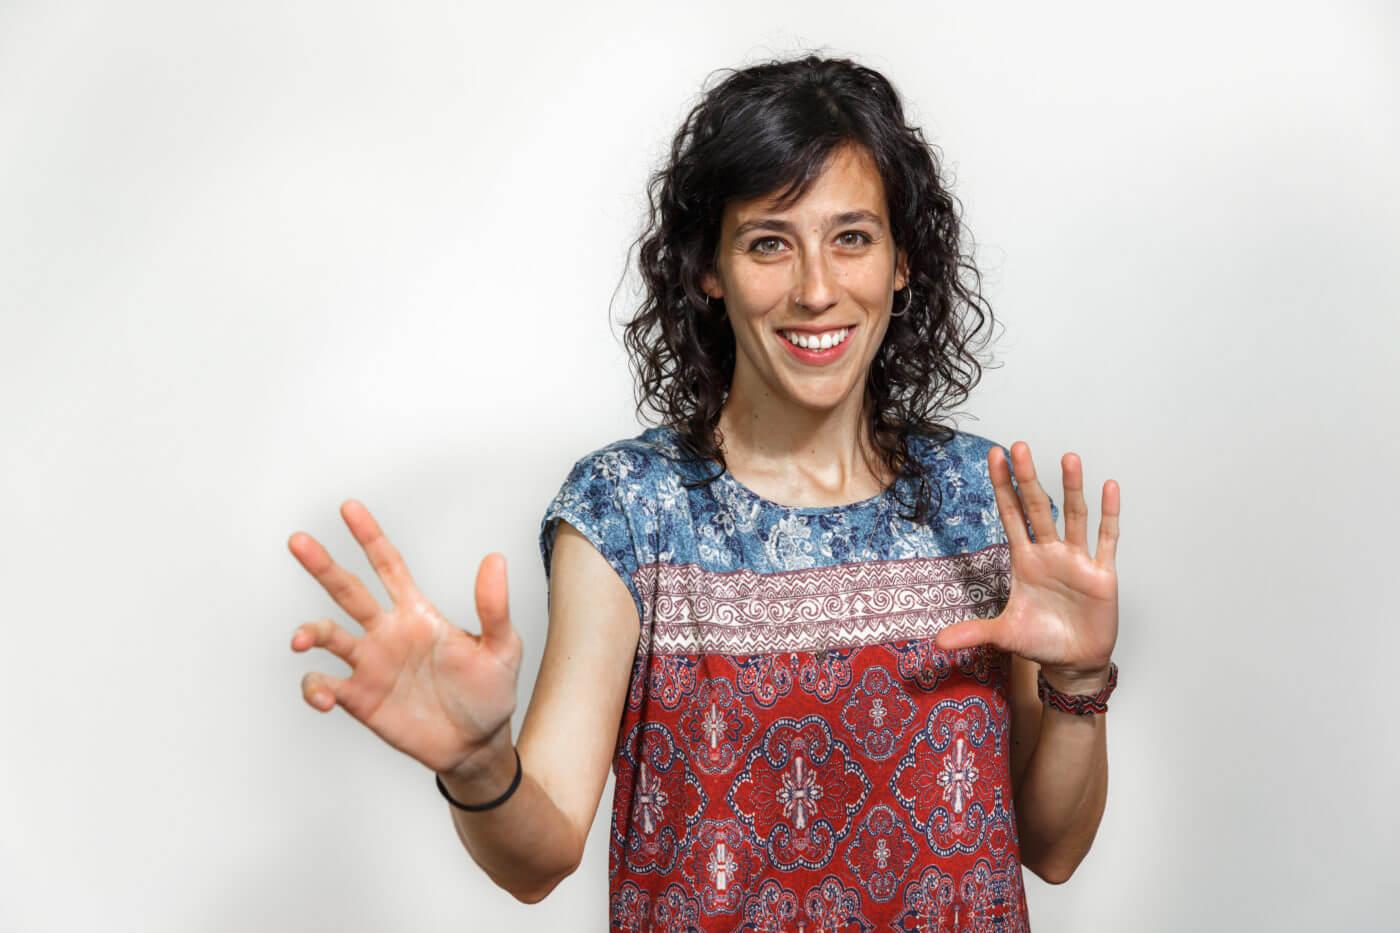 La calagurritana Marina Alonso finalista en la séptima edición de monólogos científicos de FameLab España